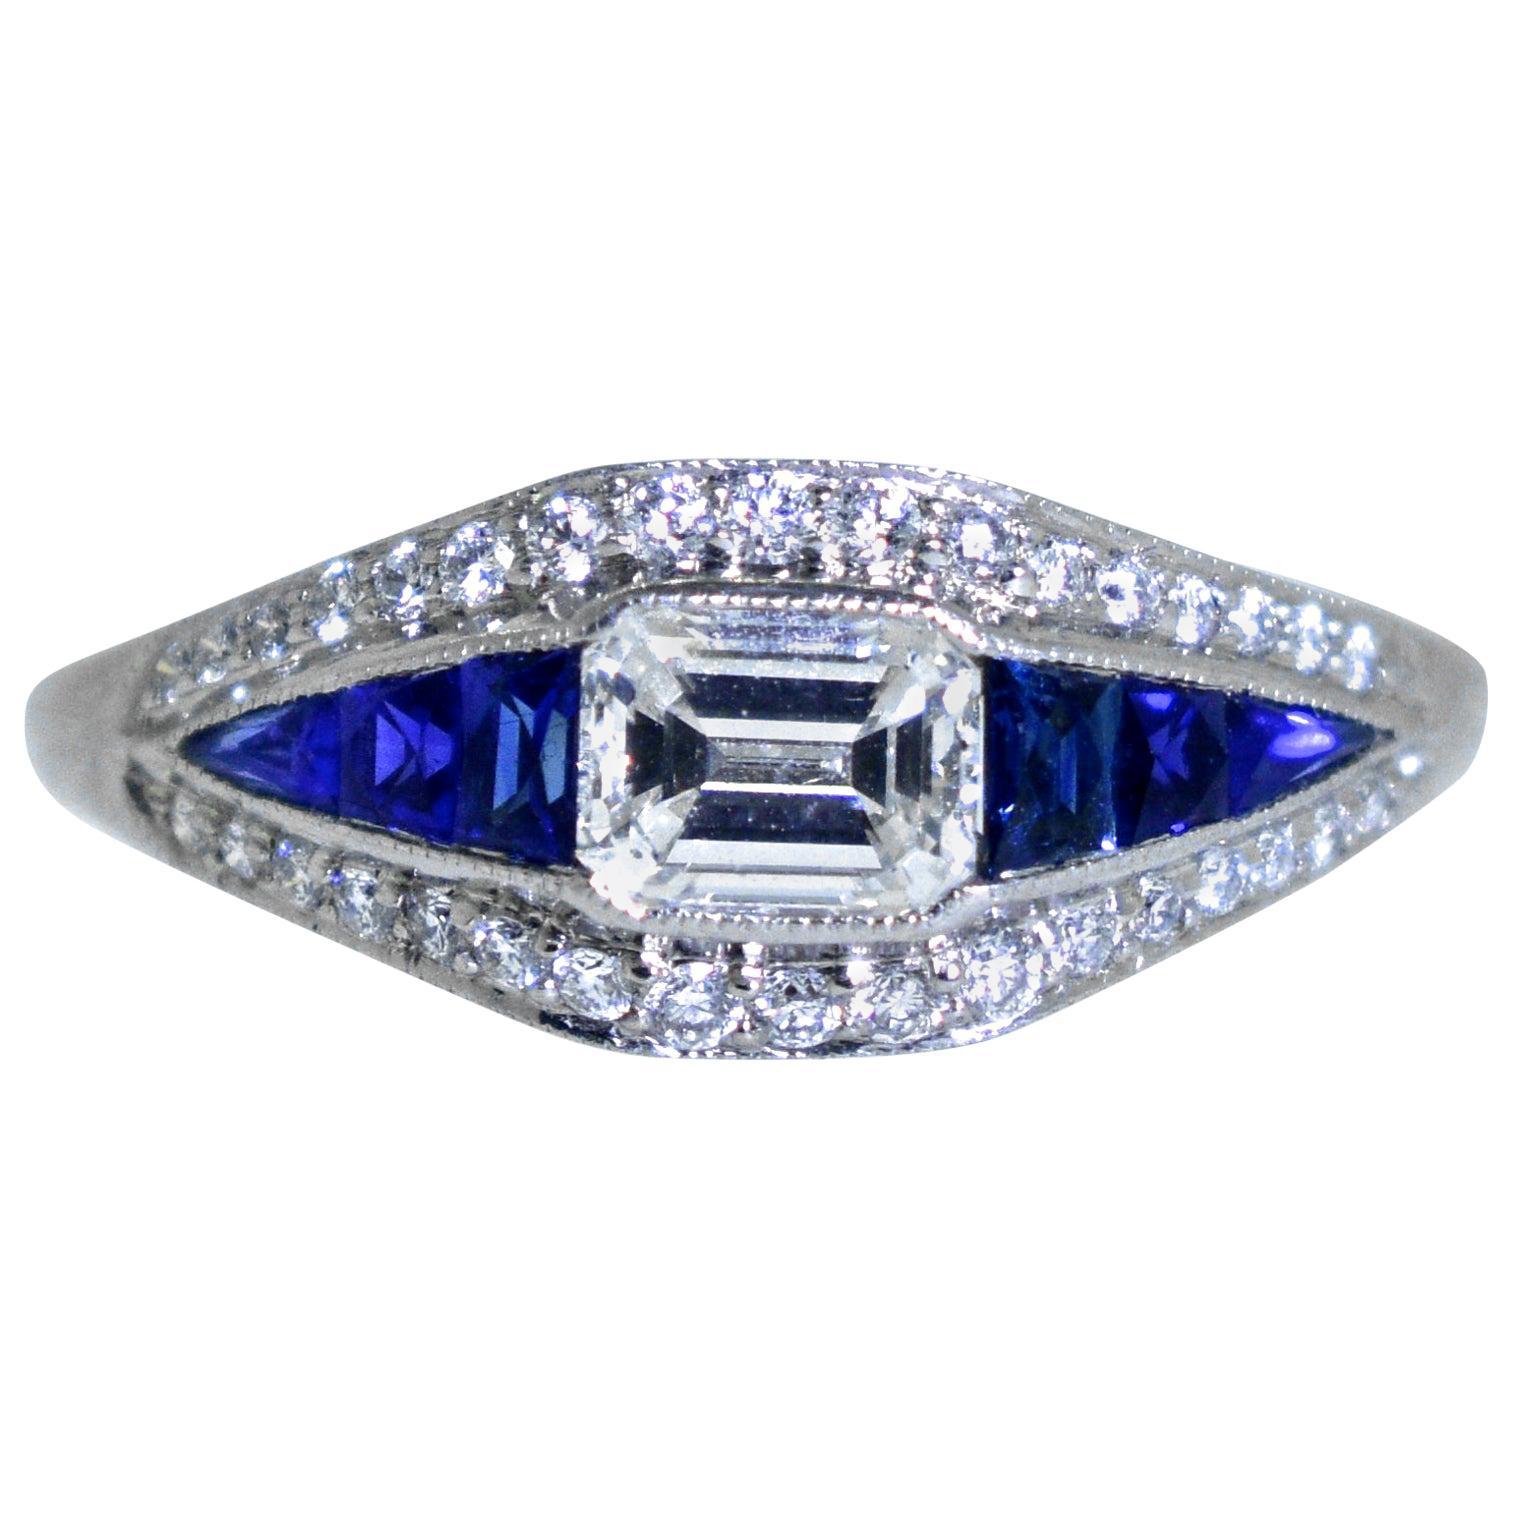 Platinum, Diamond and Natural Fancy Cut Fine Sapphire Ring